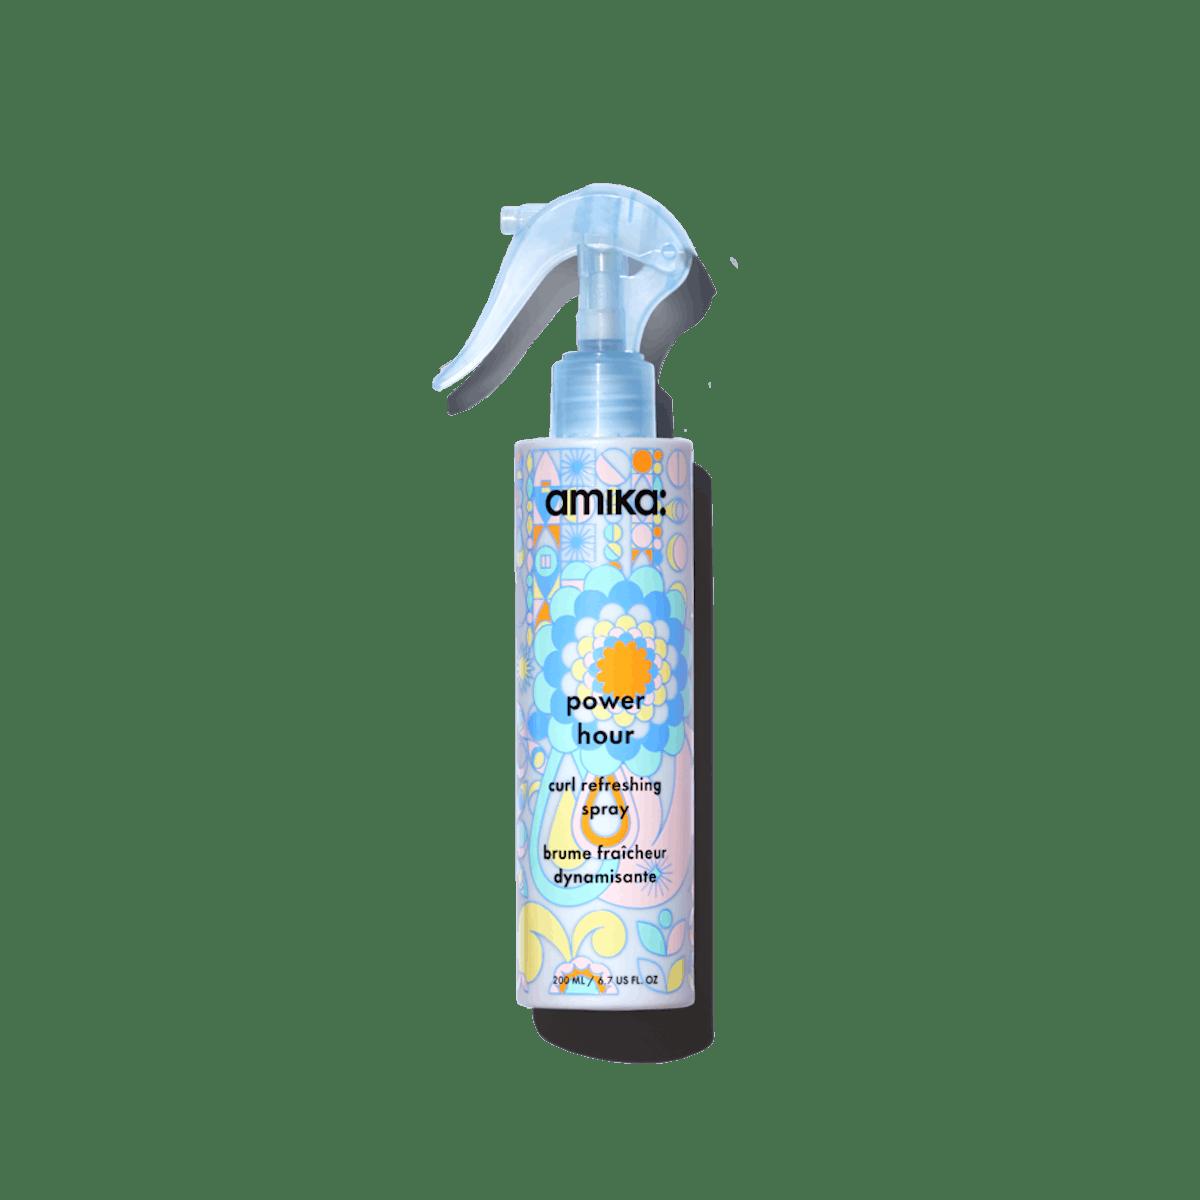 Power Hour Curl Refreshing Spray